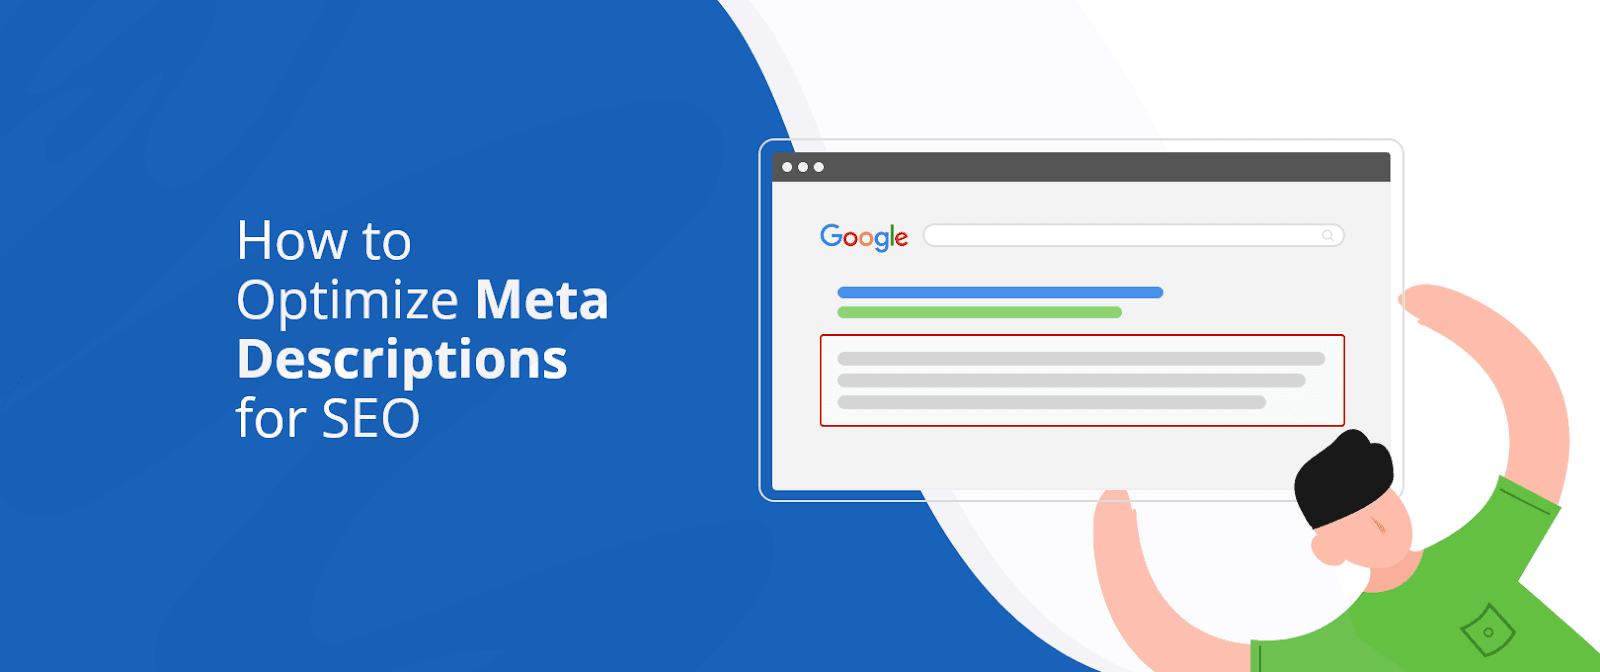 How to Optimize Meta Descriptionsfor SEO@2x